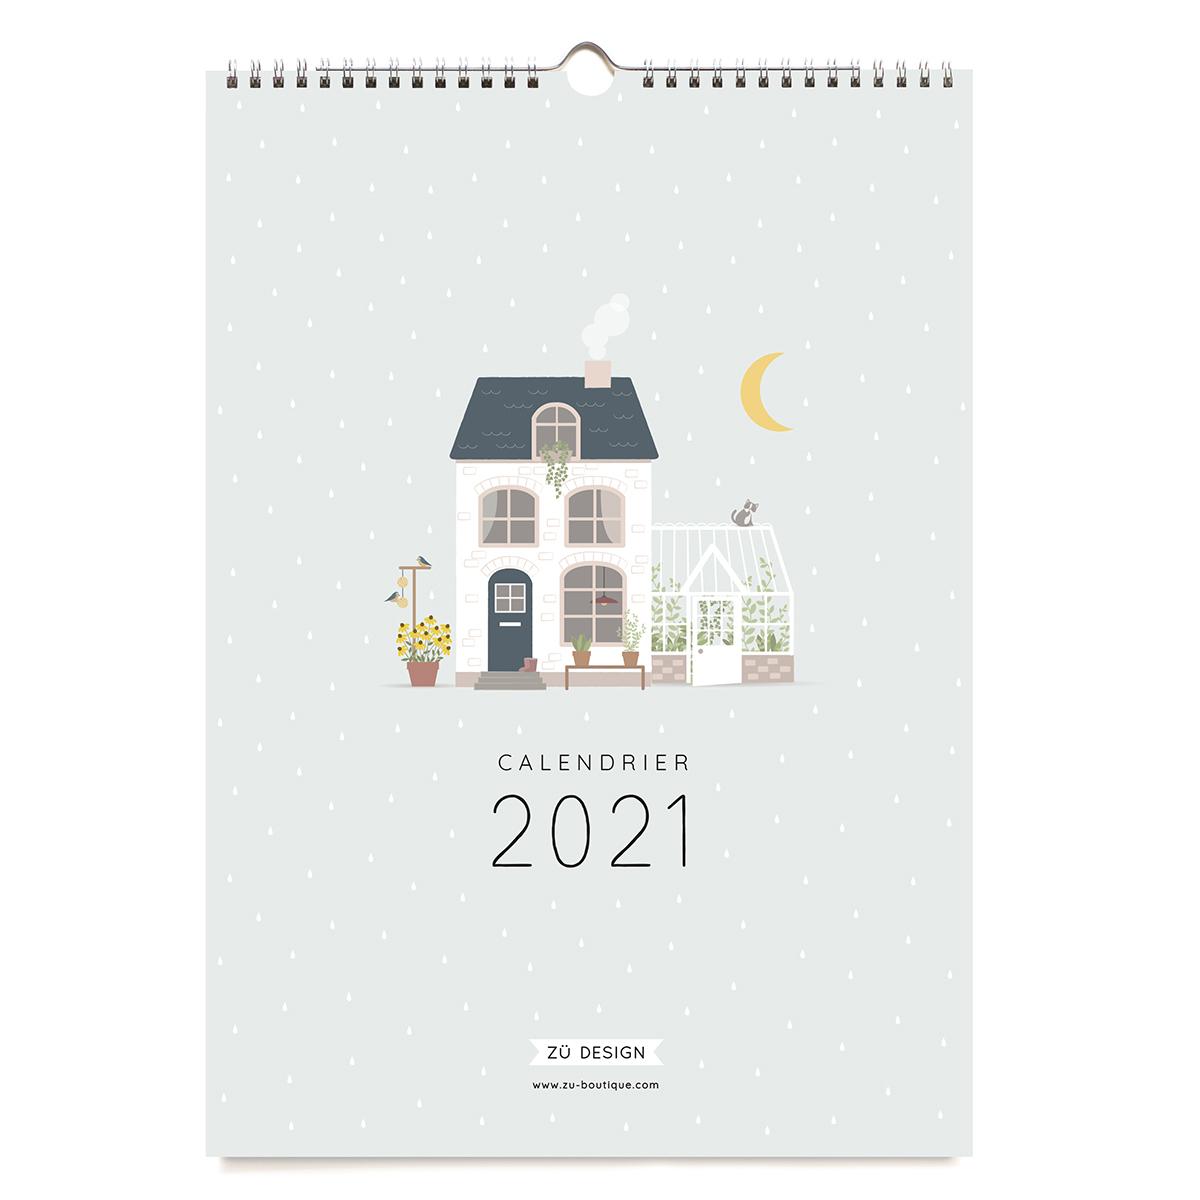 Livre & Carte Calendrier Mural 2021 Calendrier Mural 2021